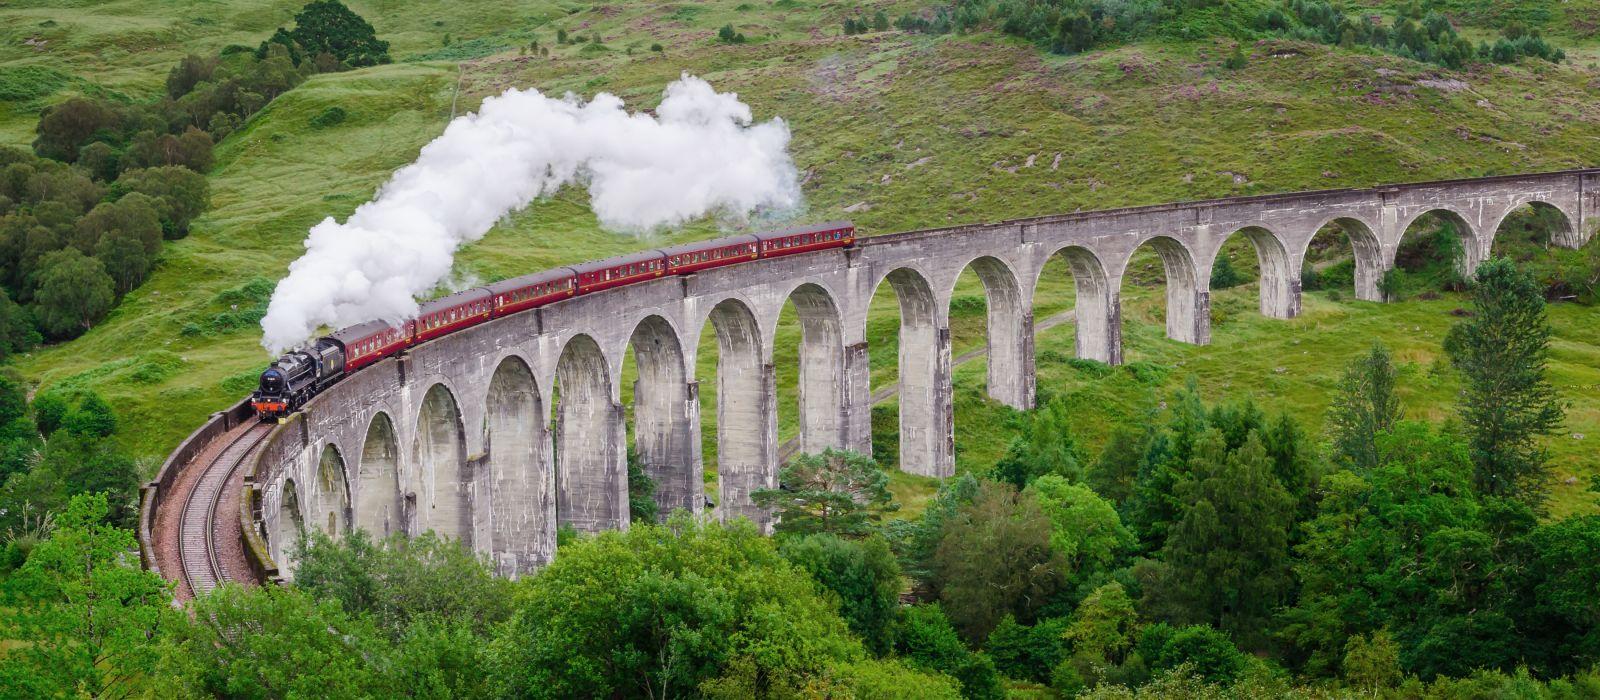 Jacobite steam train on Glenfinnan Viaduct approaching, Highlands, Scotland, United Kingdom, Europe